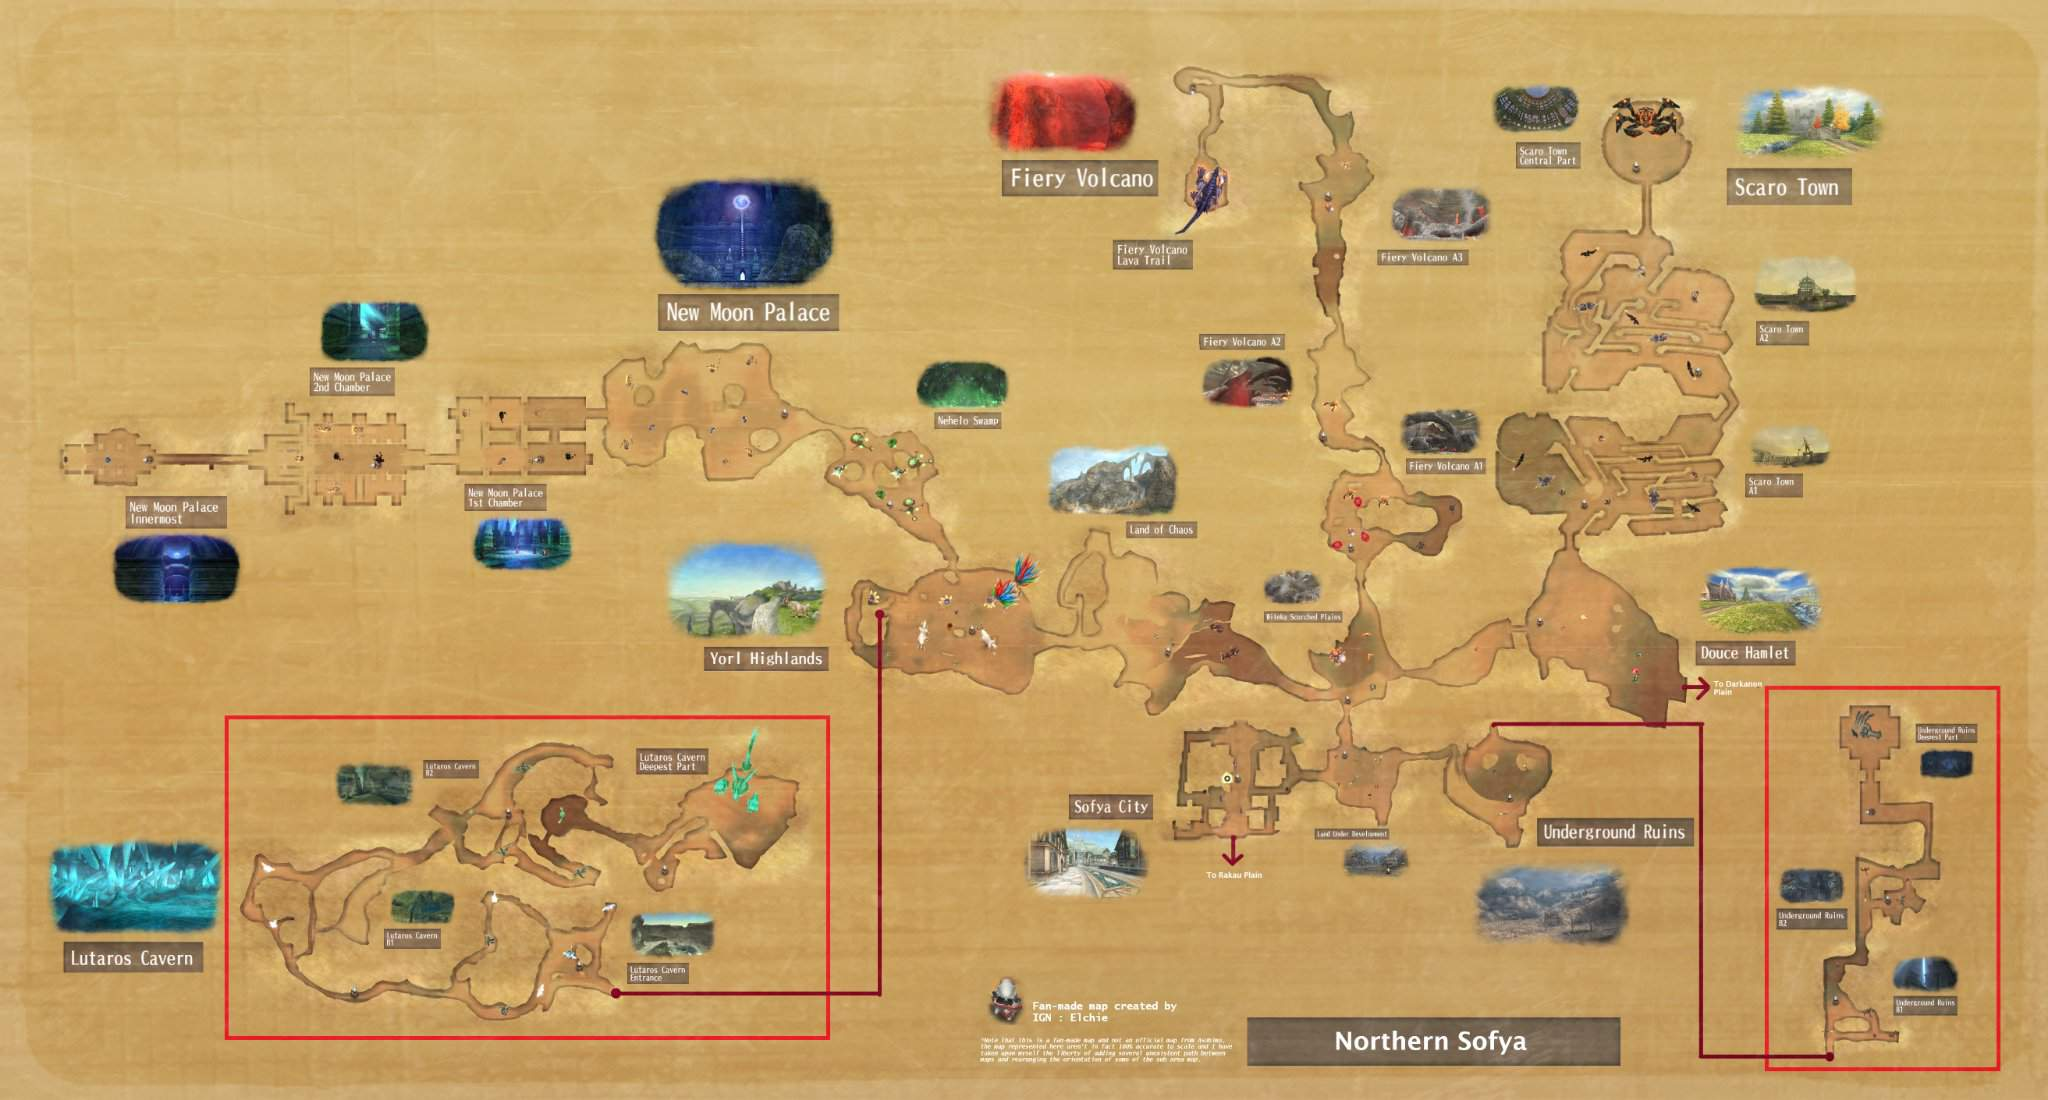 toram online world map Toram World Map Project Northern Sofya Toram Online Amino